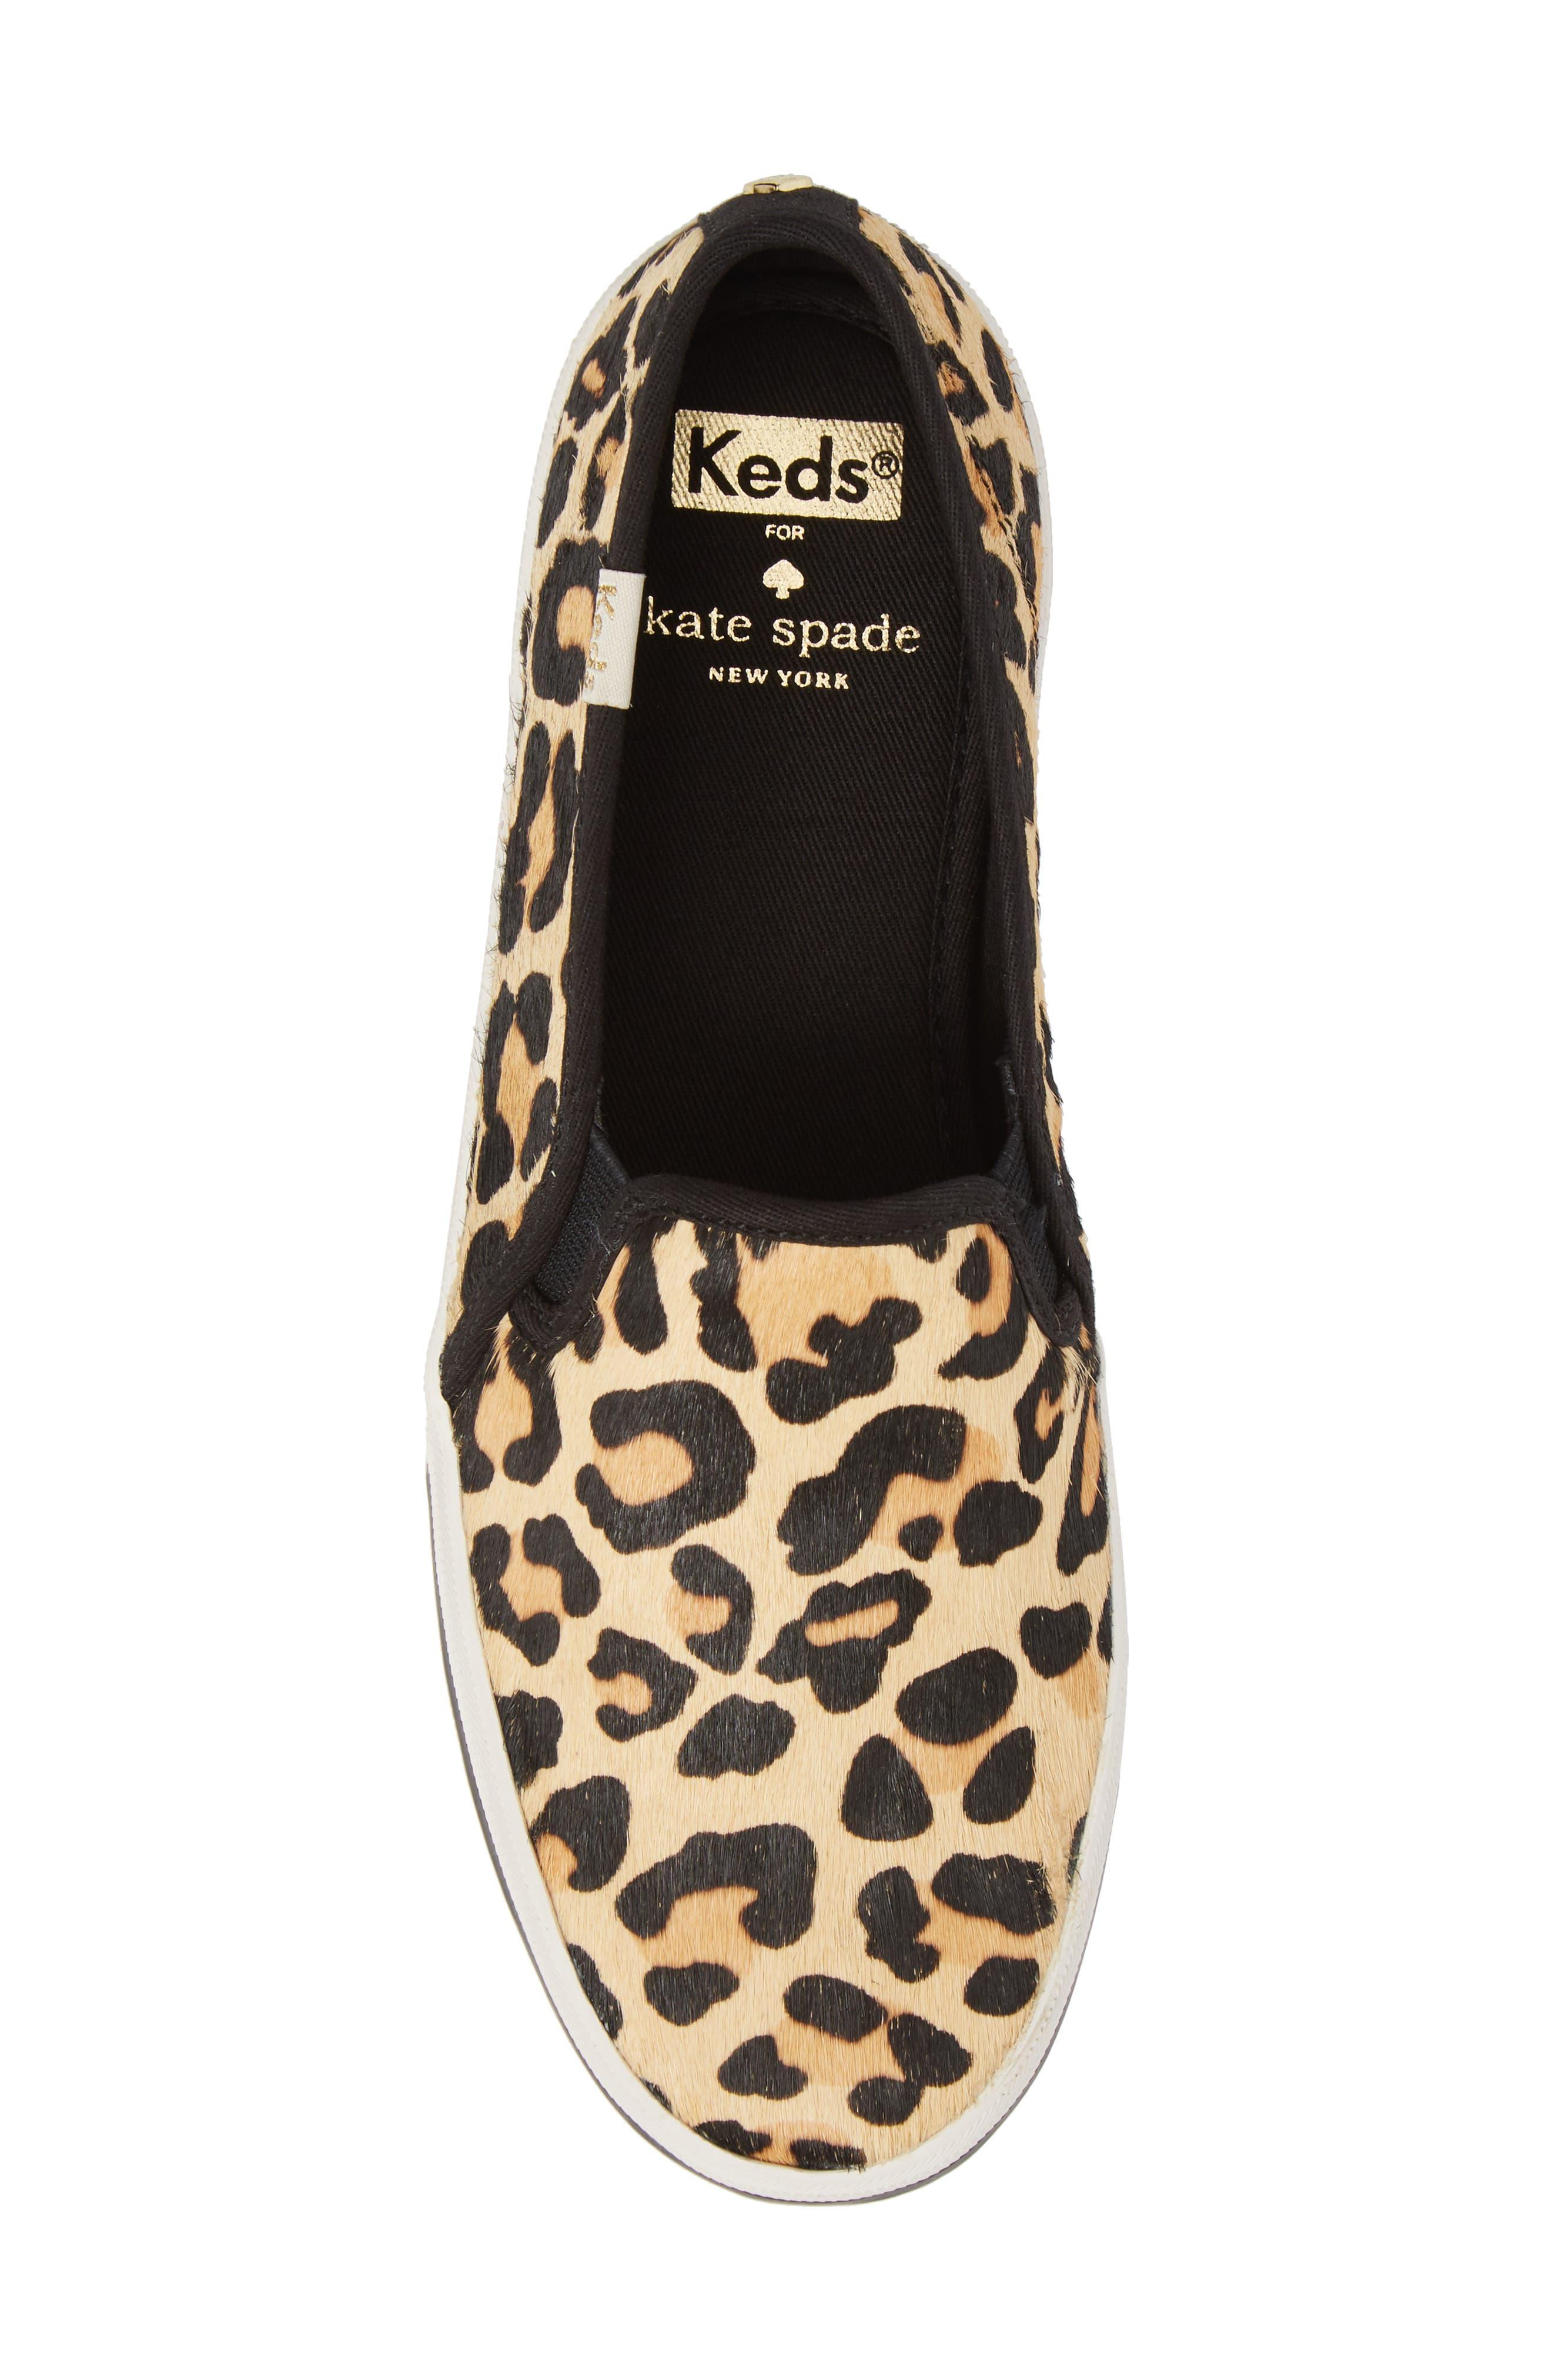 KEDS<SUP>®</SUP> FOR KATE SPADE NEW YORK, Keds<sup>®</sup> x kate spade Double Decker Slip-On Sneaker, Alternate thumbnail 5, color, TAN PONY HAIR